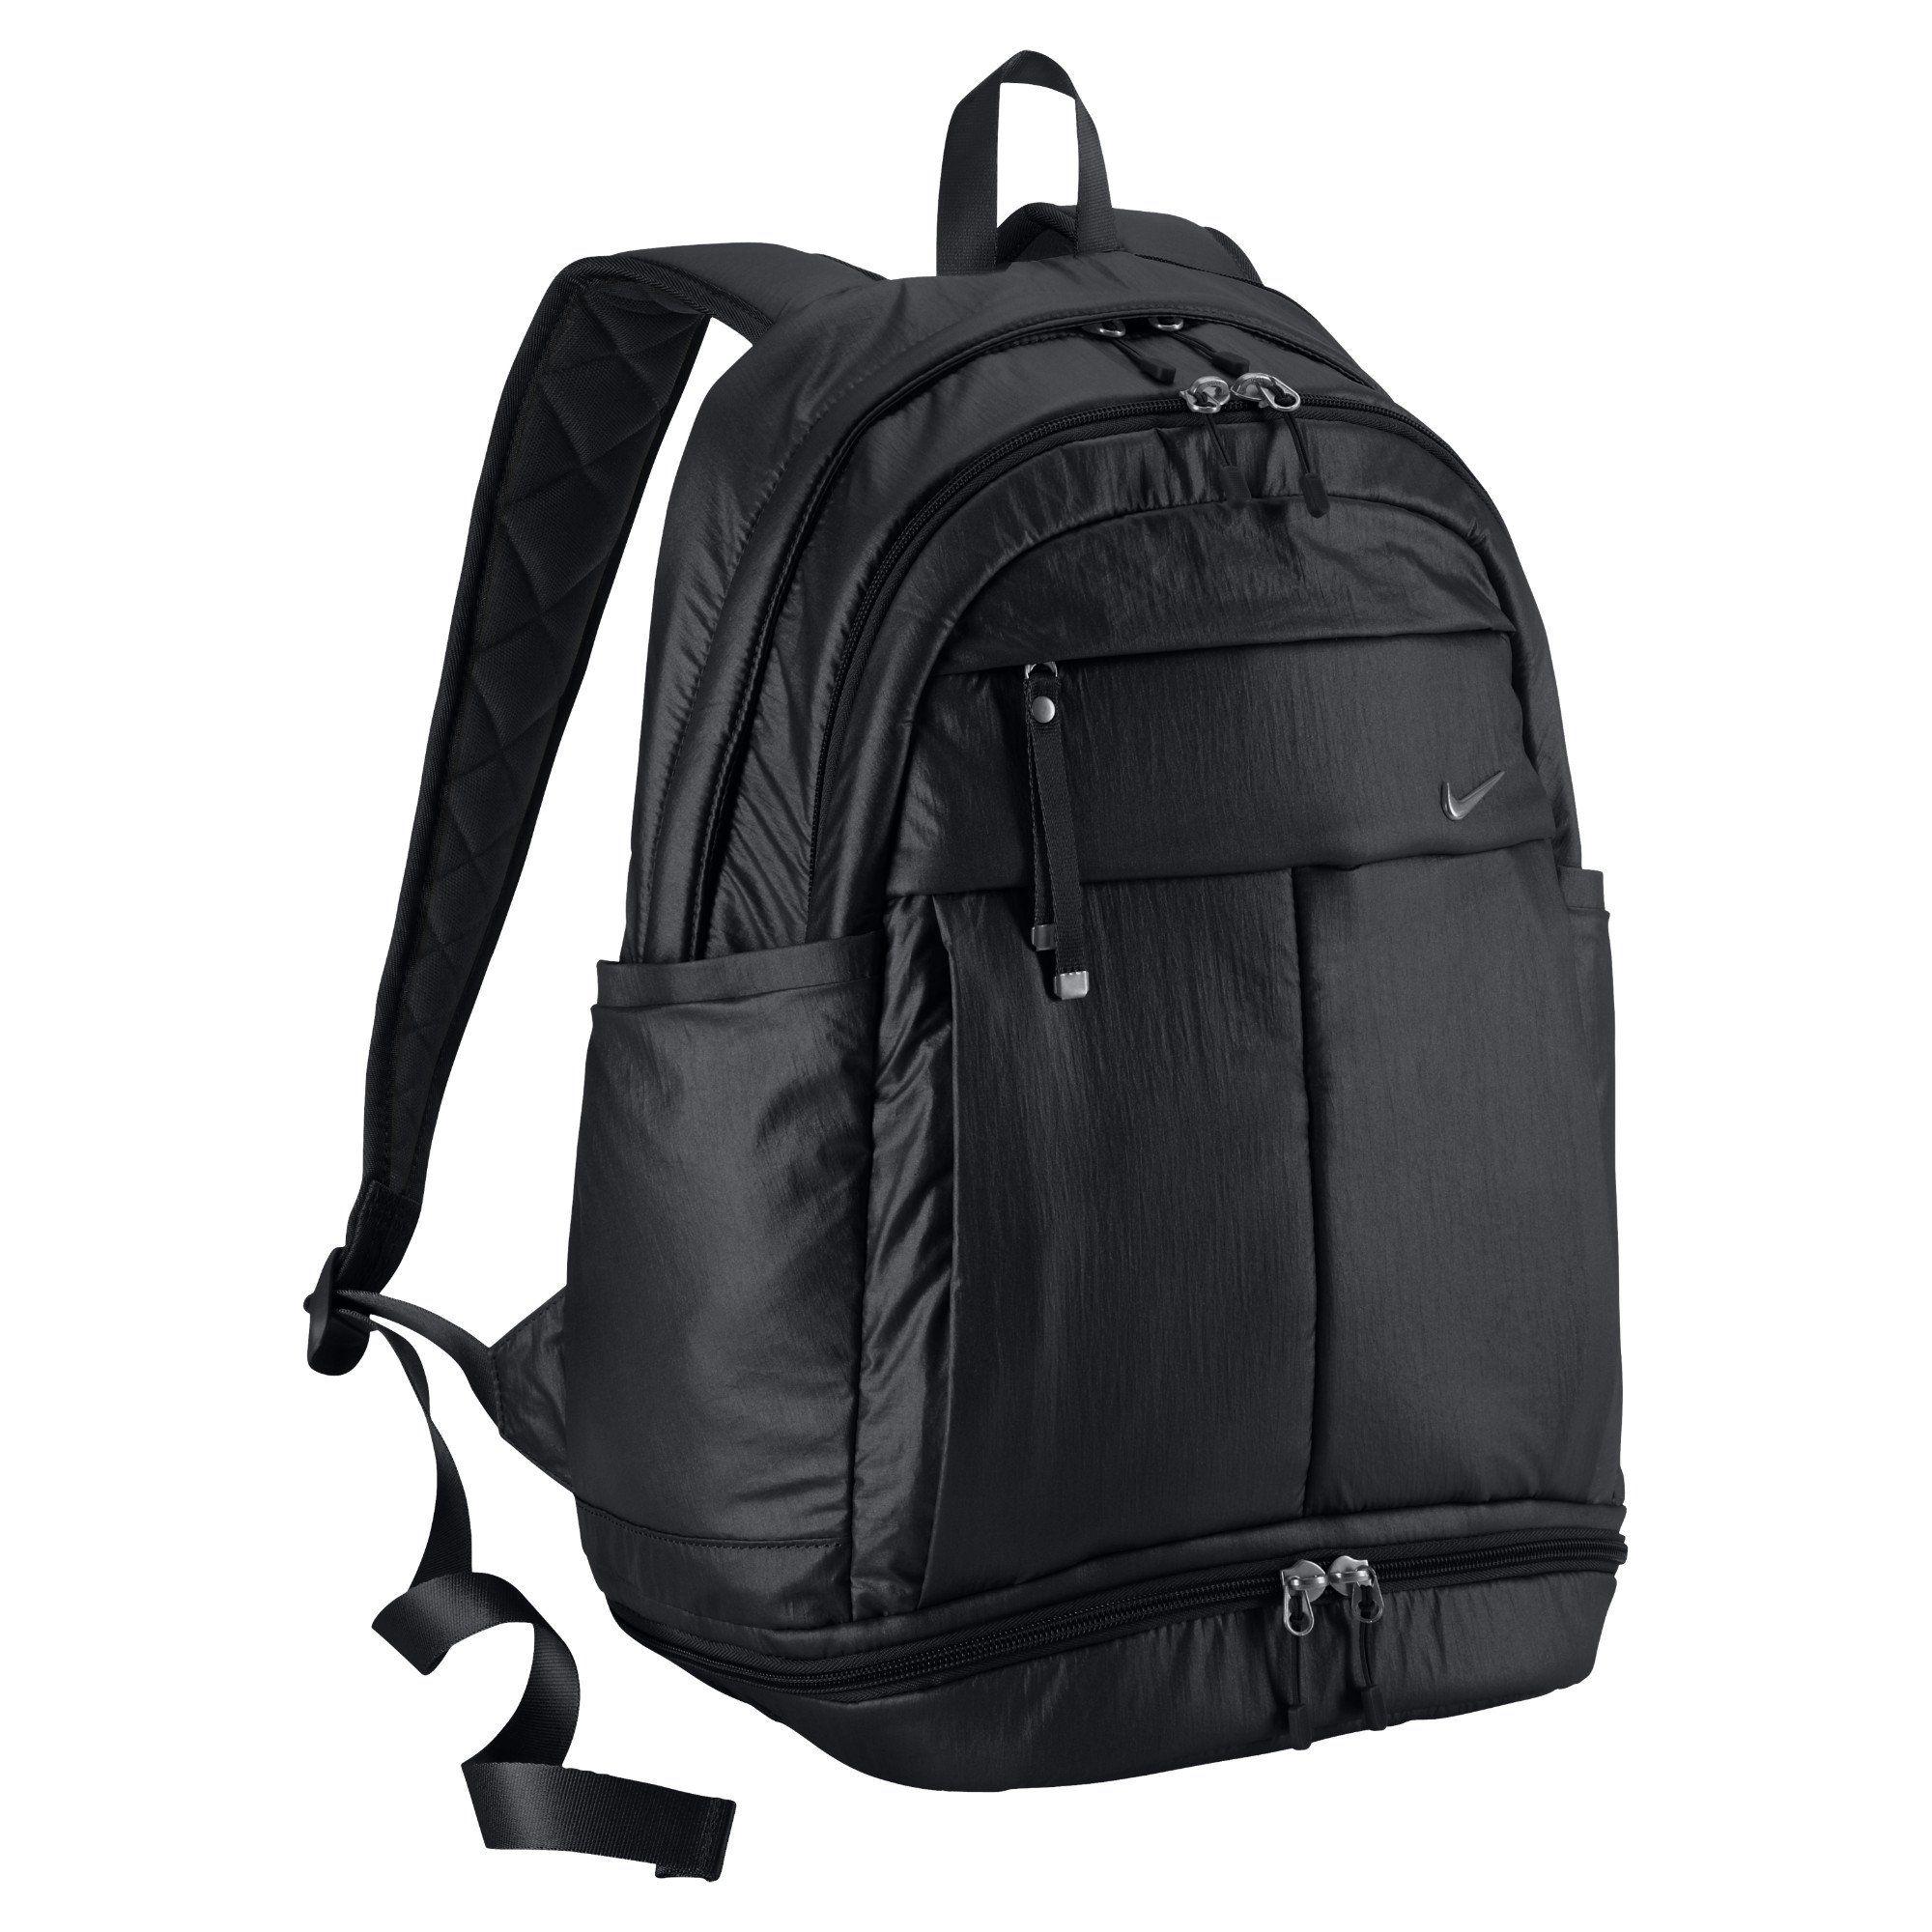 8af51cfc988 All Black Nike Bookbag- Fenix Toulouse Handball